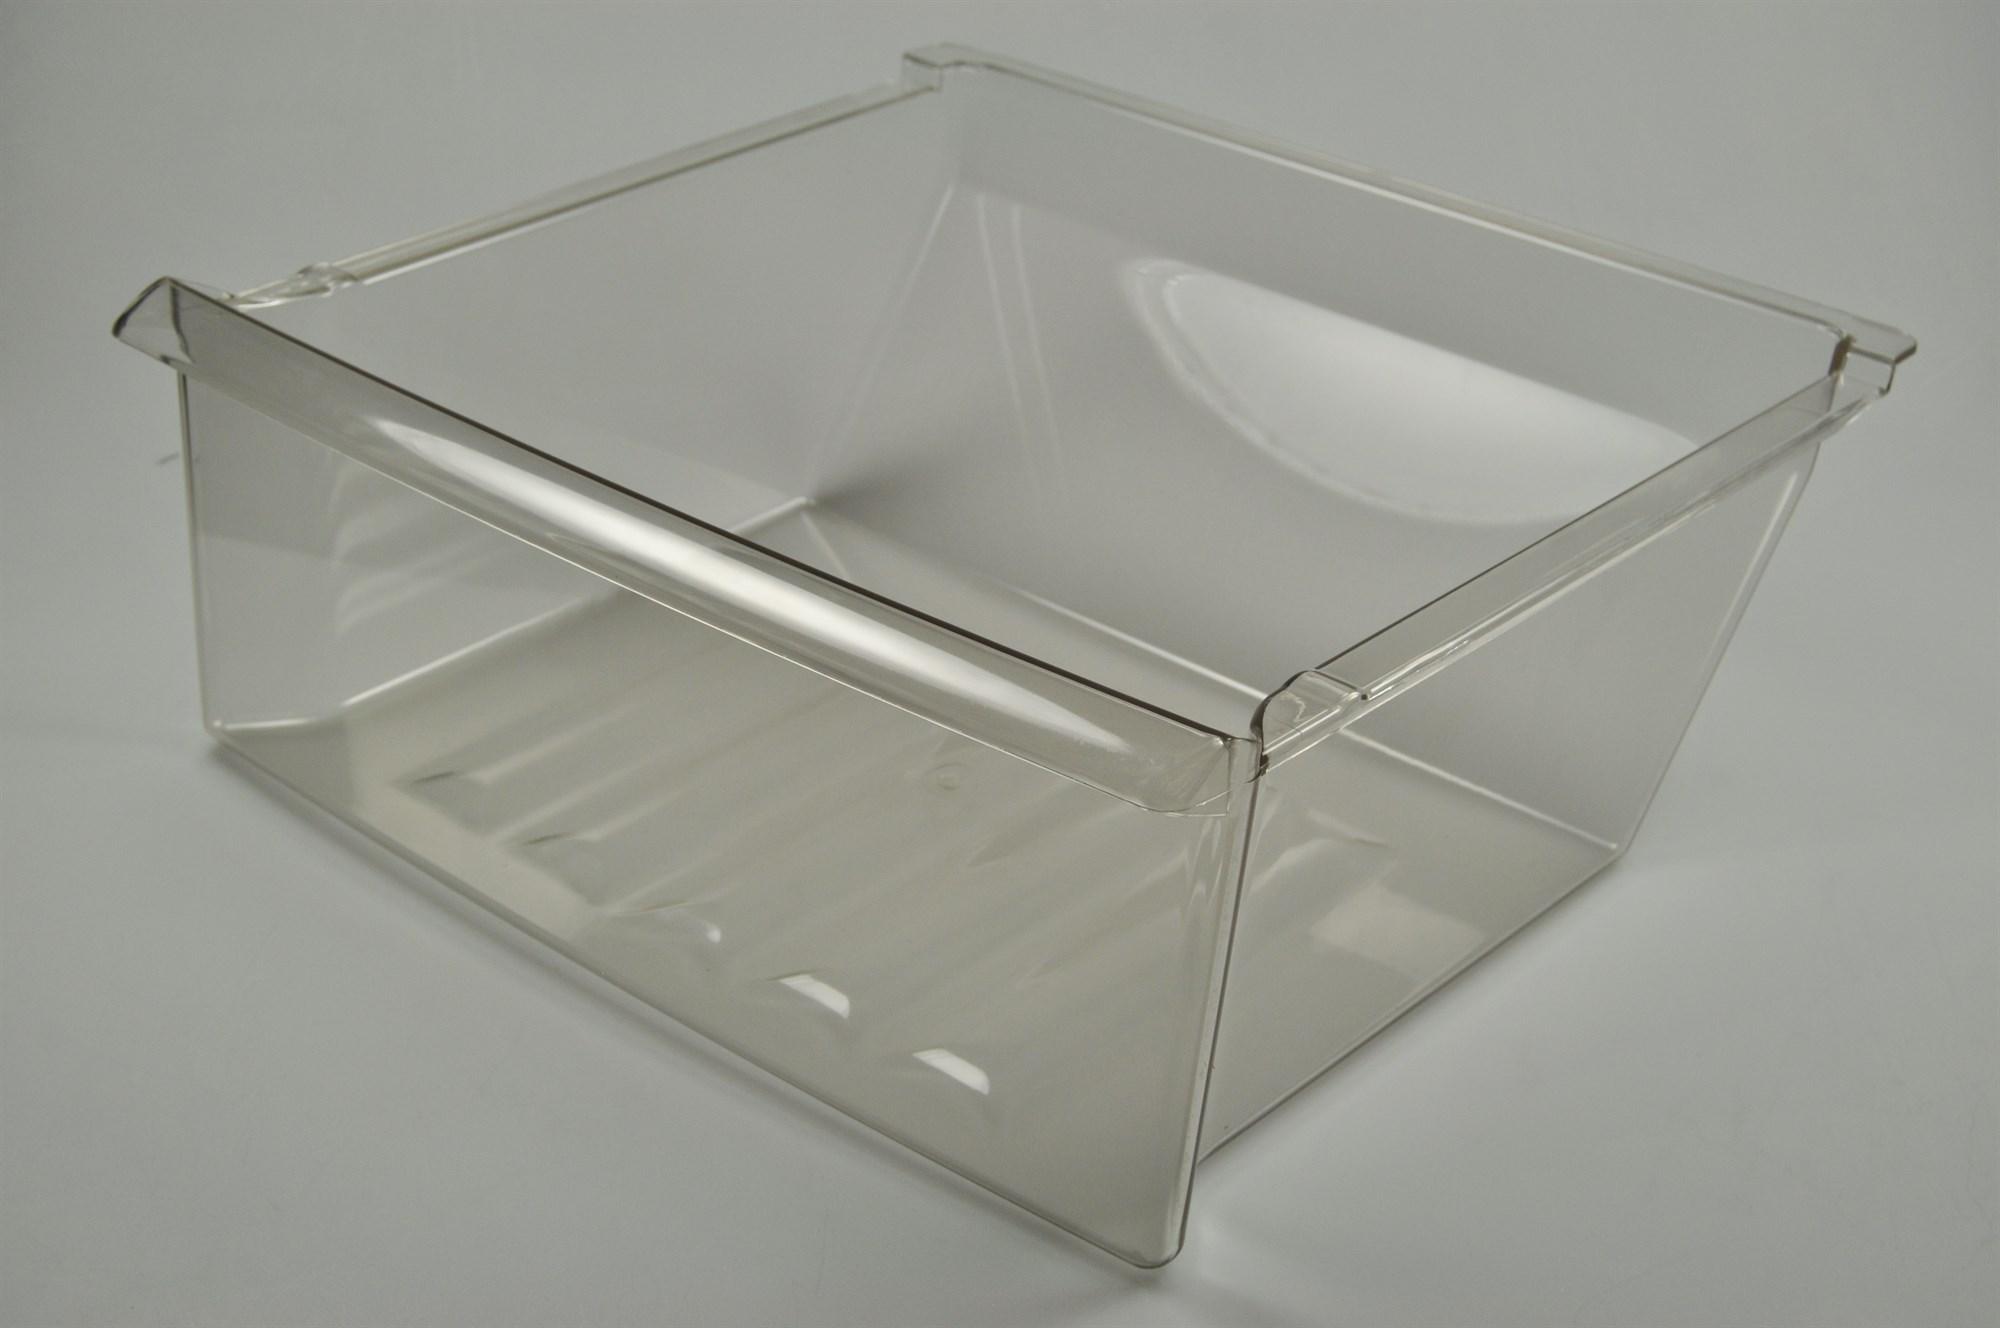 bac l gume gaggenau frigo cong lateur 165mm x 433mm x 405mm. Black Bedroom Furniture Sets. Home Design Ideas